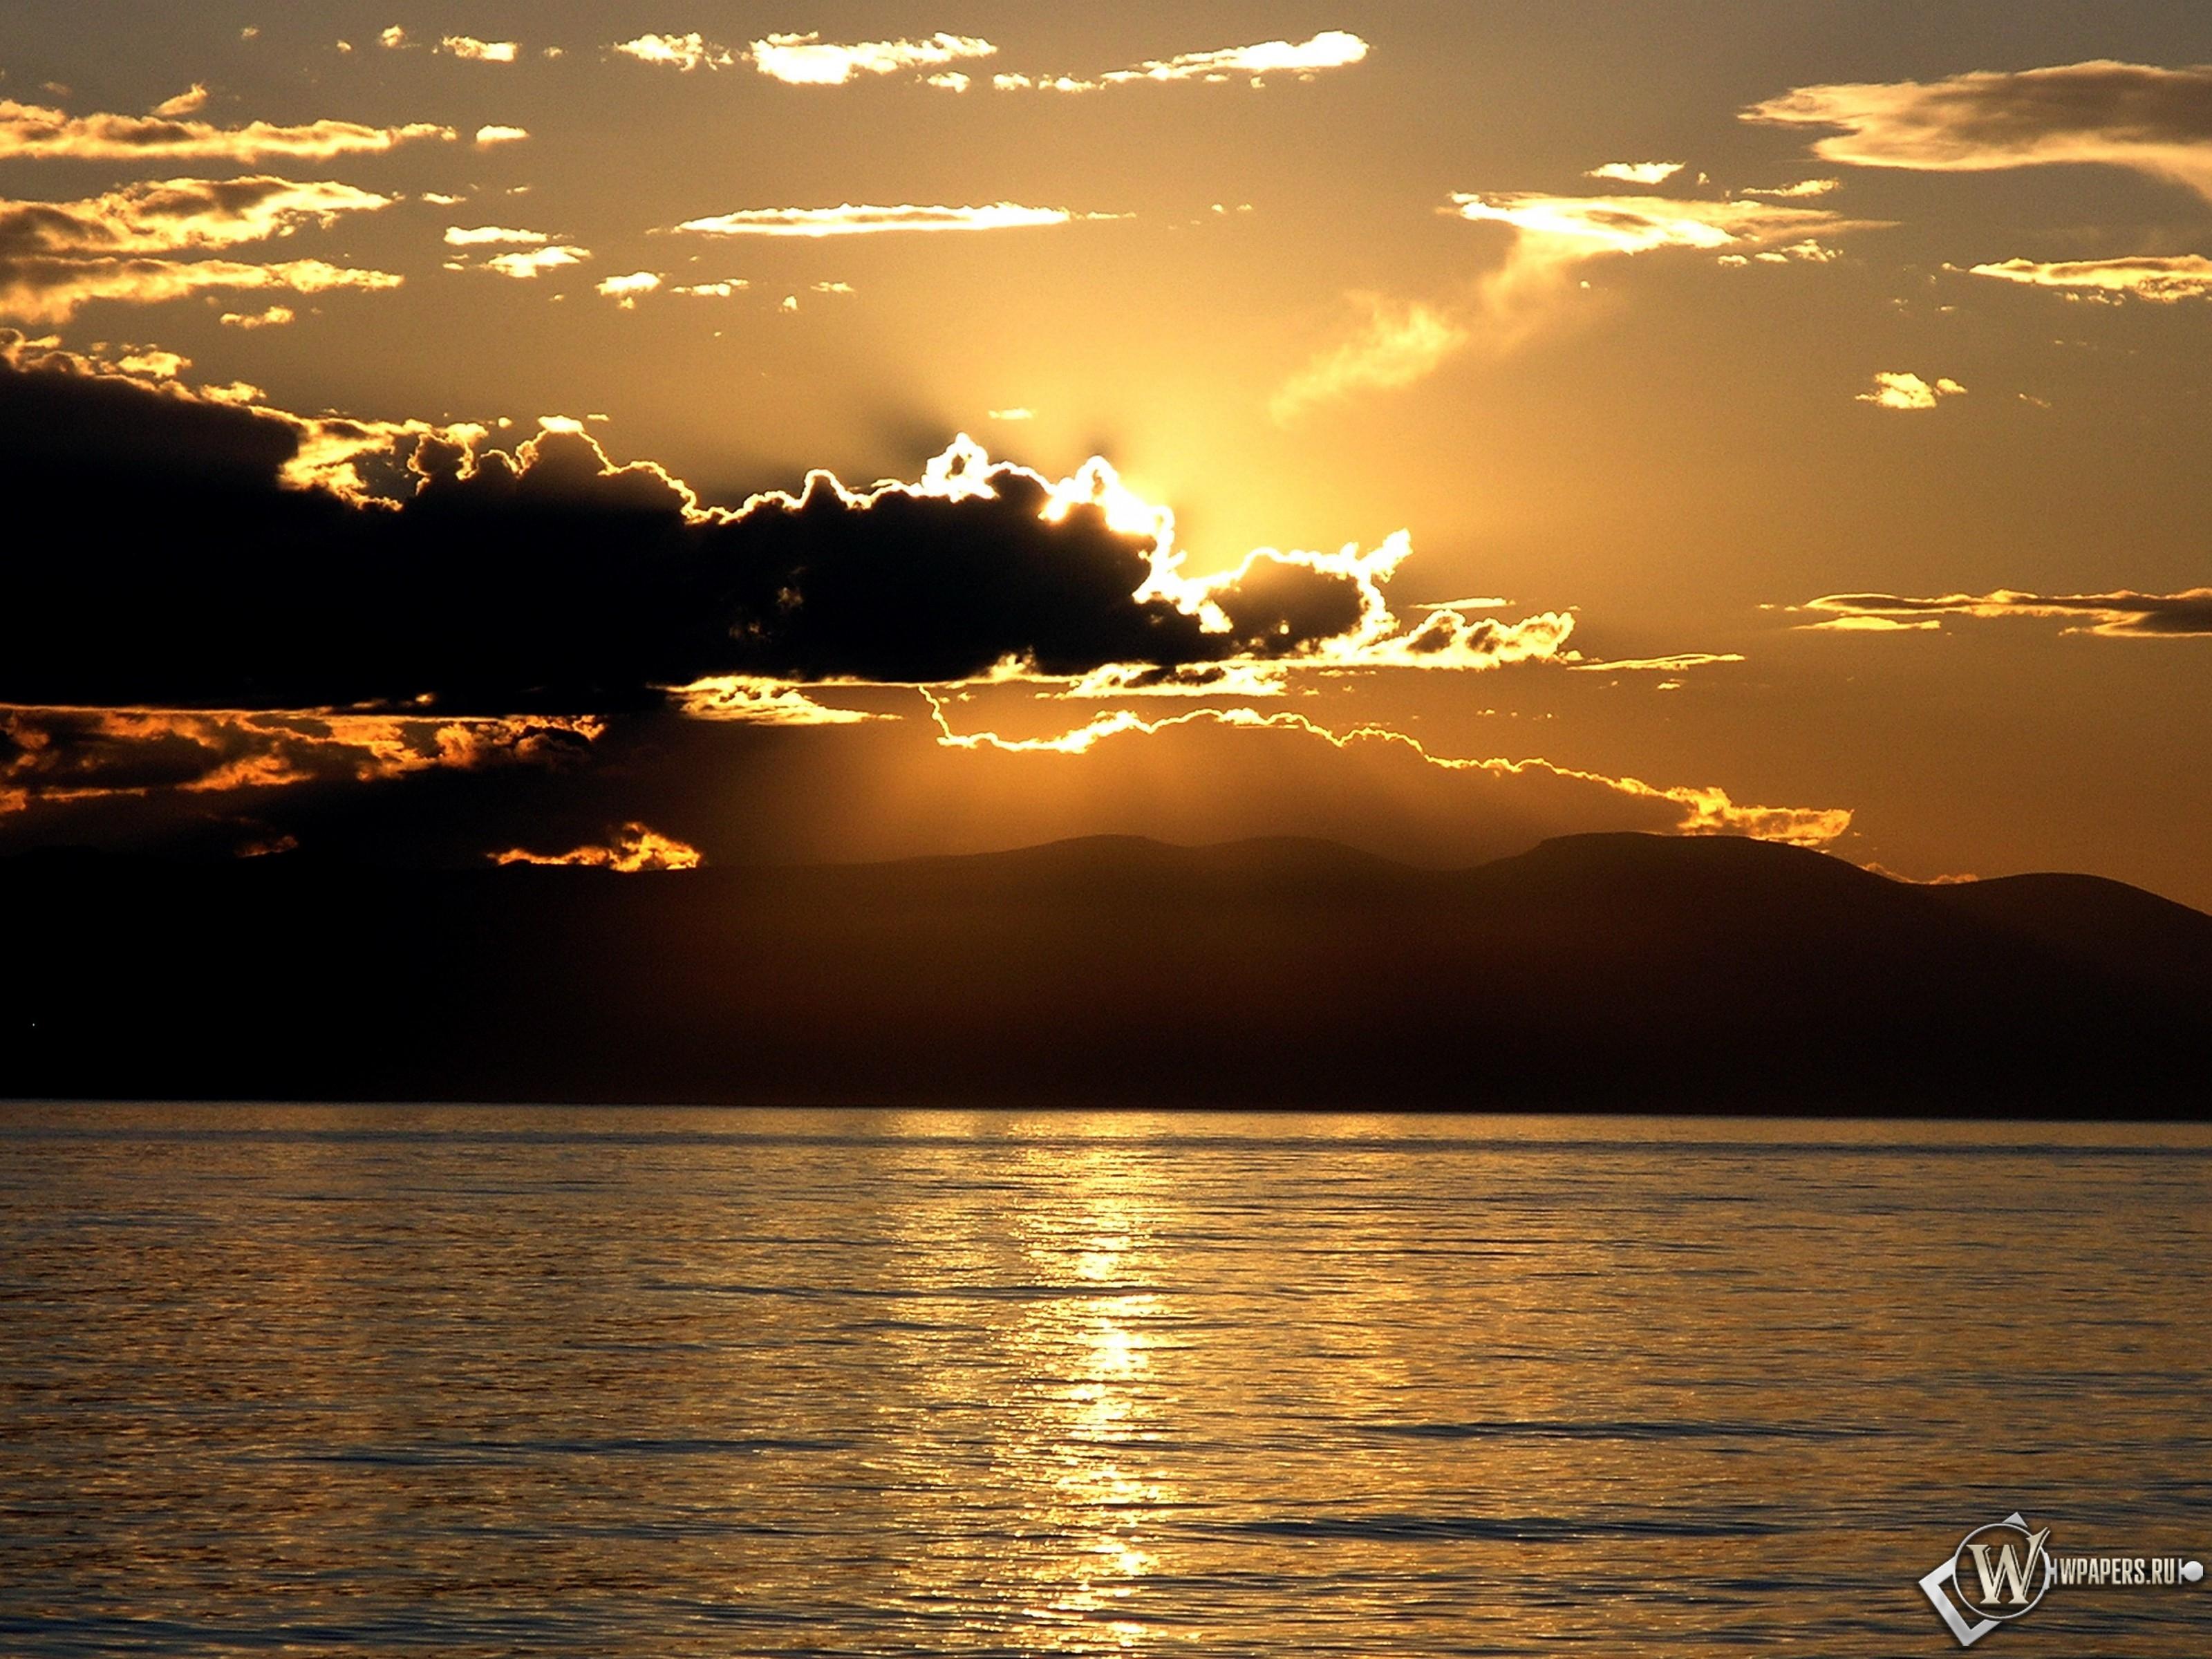 Солнце за облаком на Байкале 3200x2400